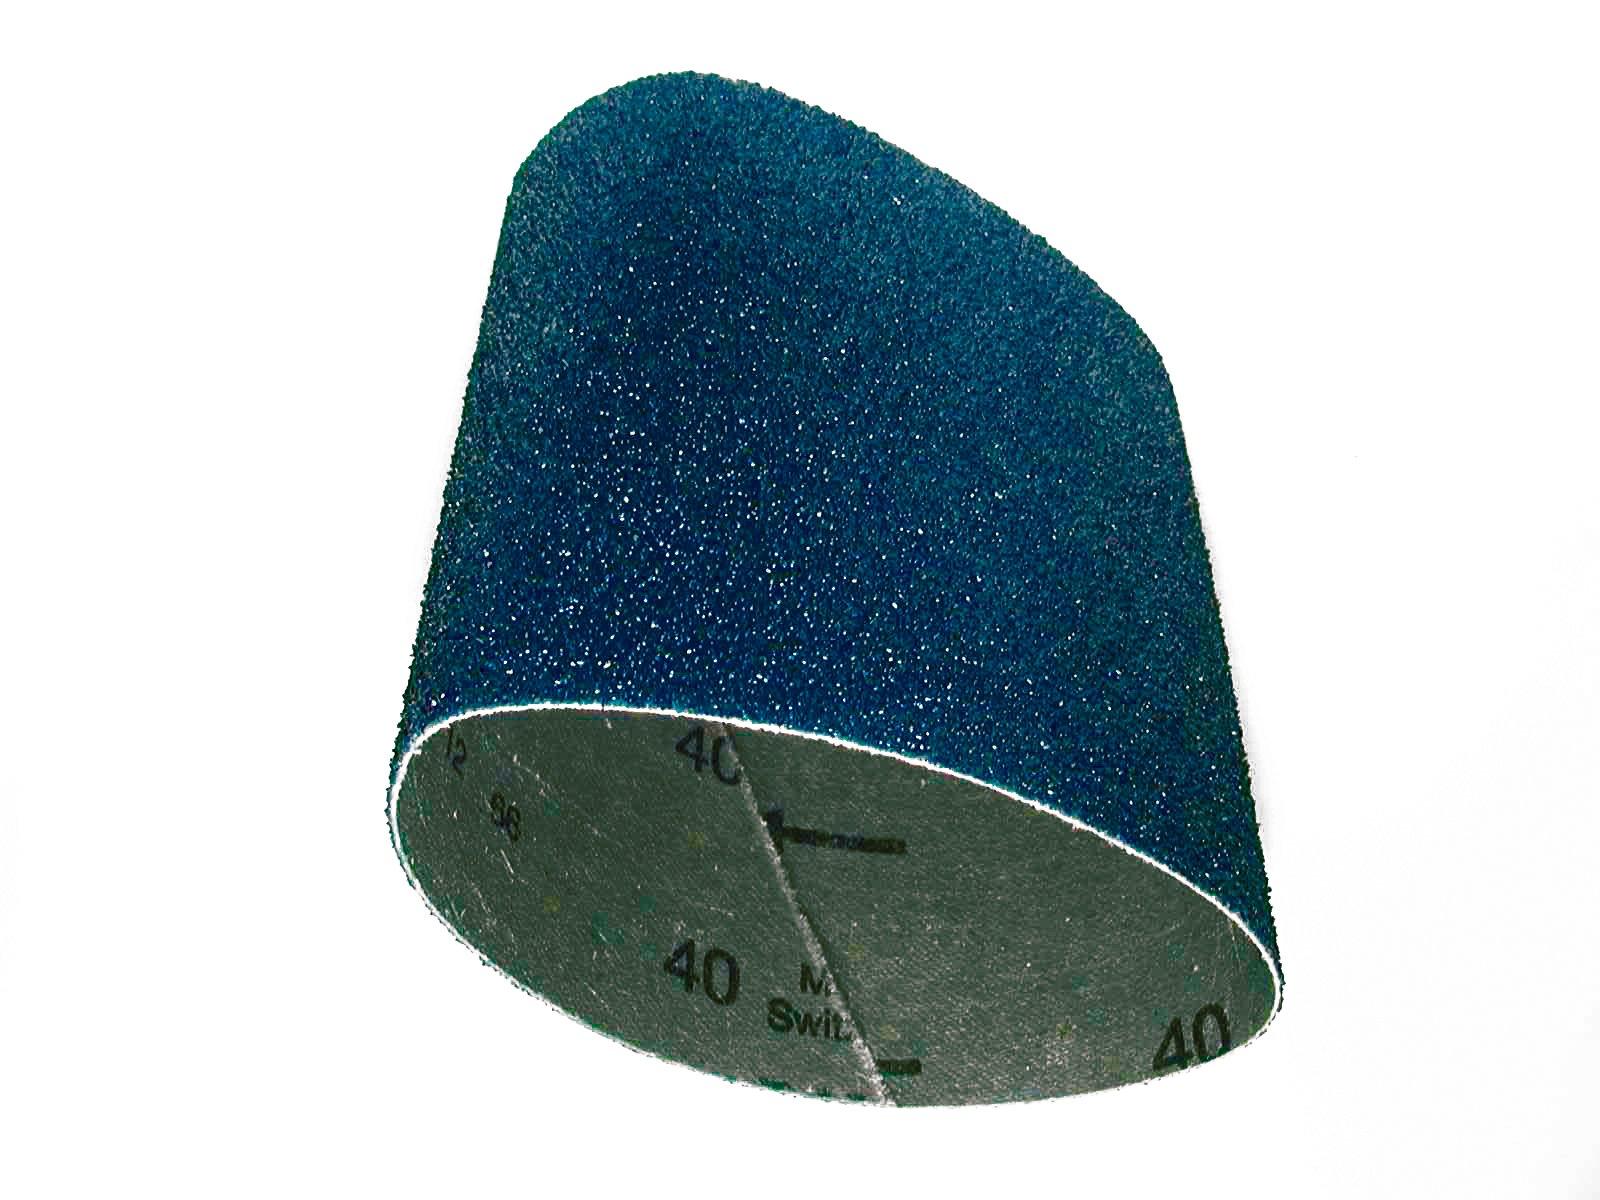 CS Unitec 42120 PTX Zirconium Grinding Belt Sleeve, 120 Grit, 3-1/2'' Diameter x 4'' Wide, (Pack of 10) by C.S. Unitec